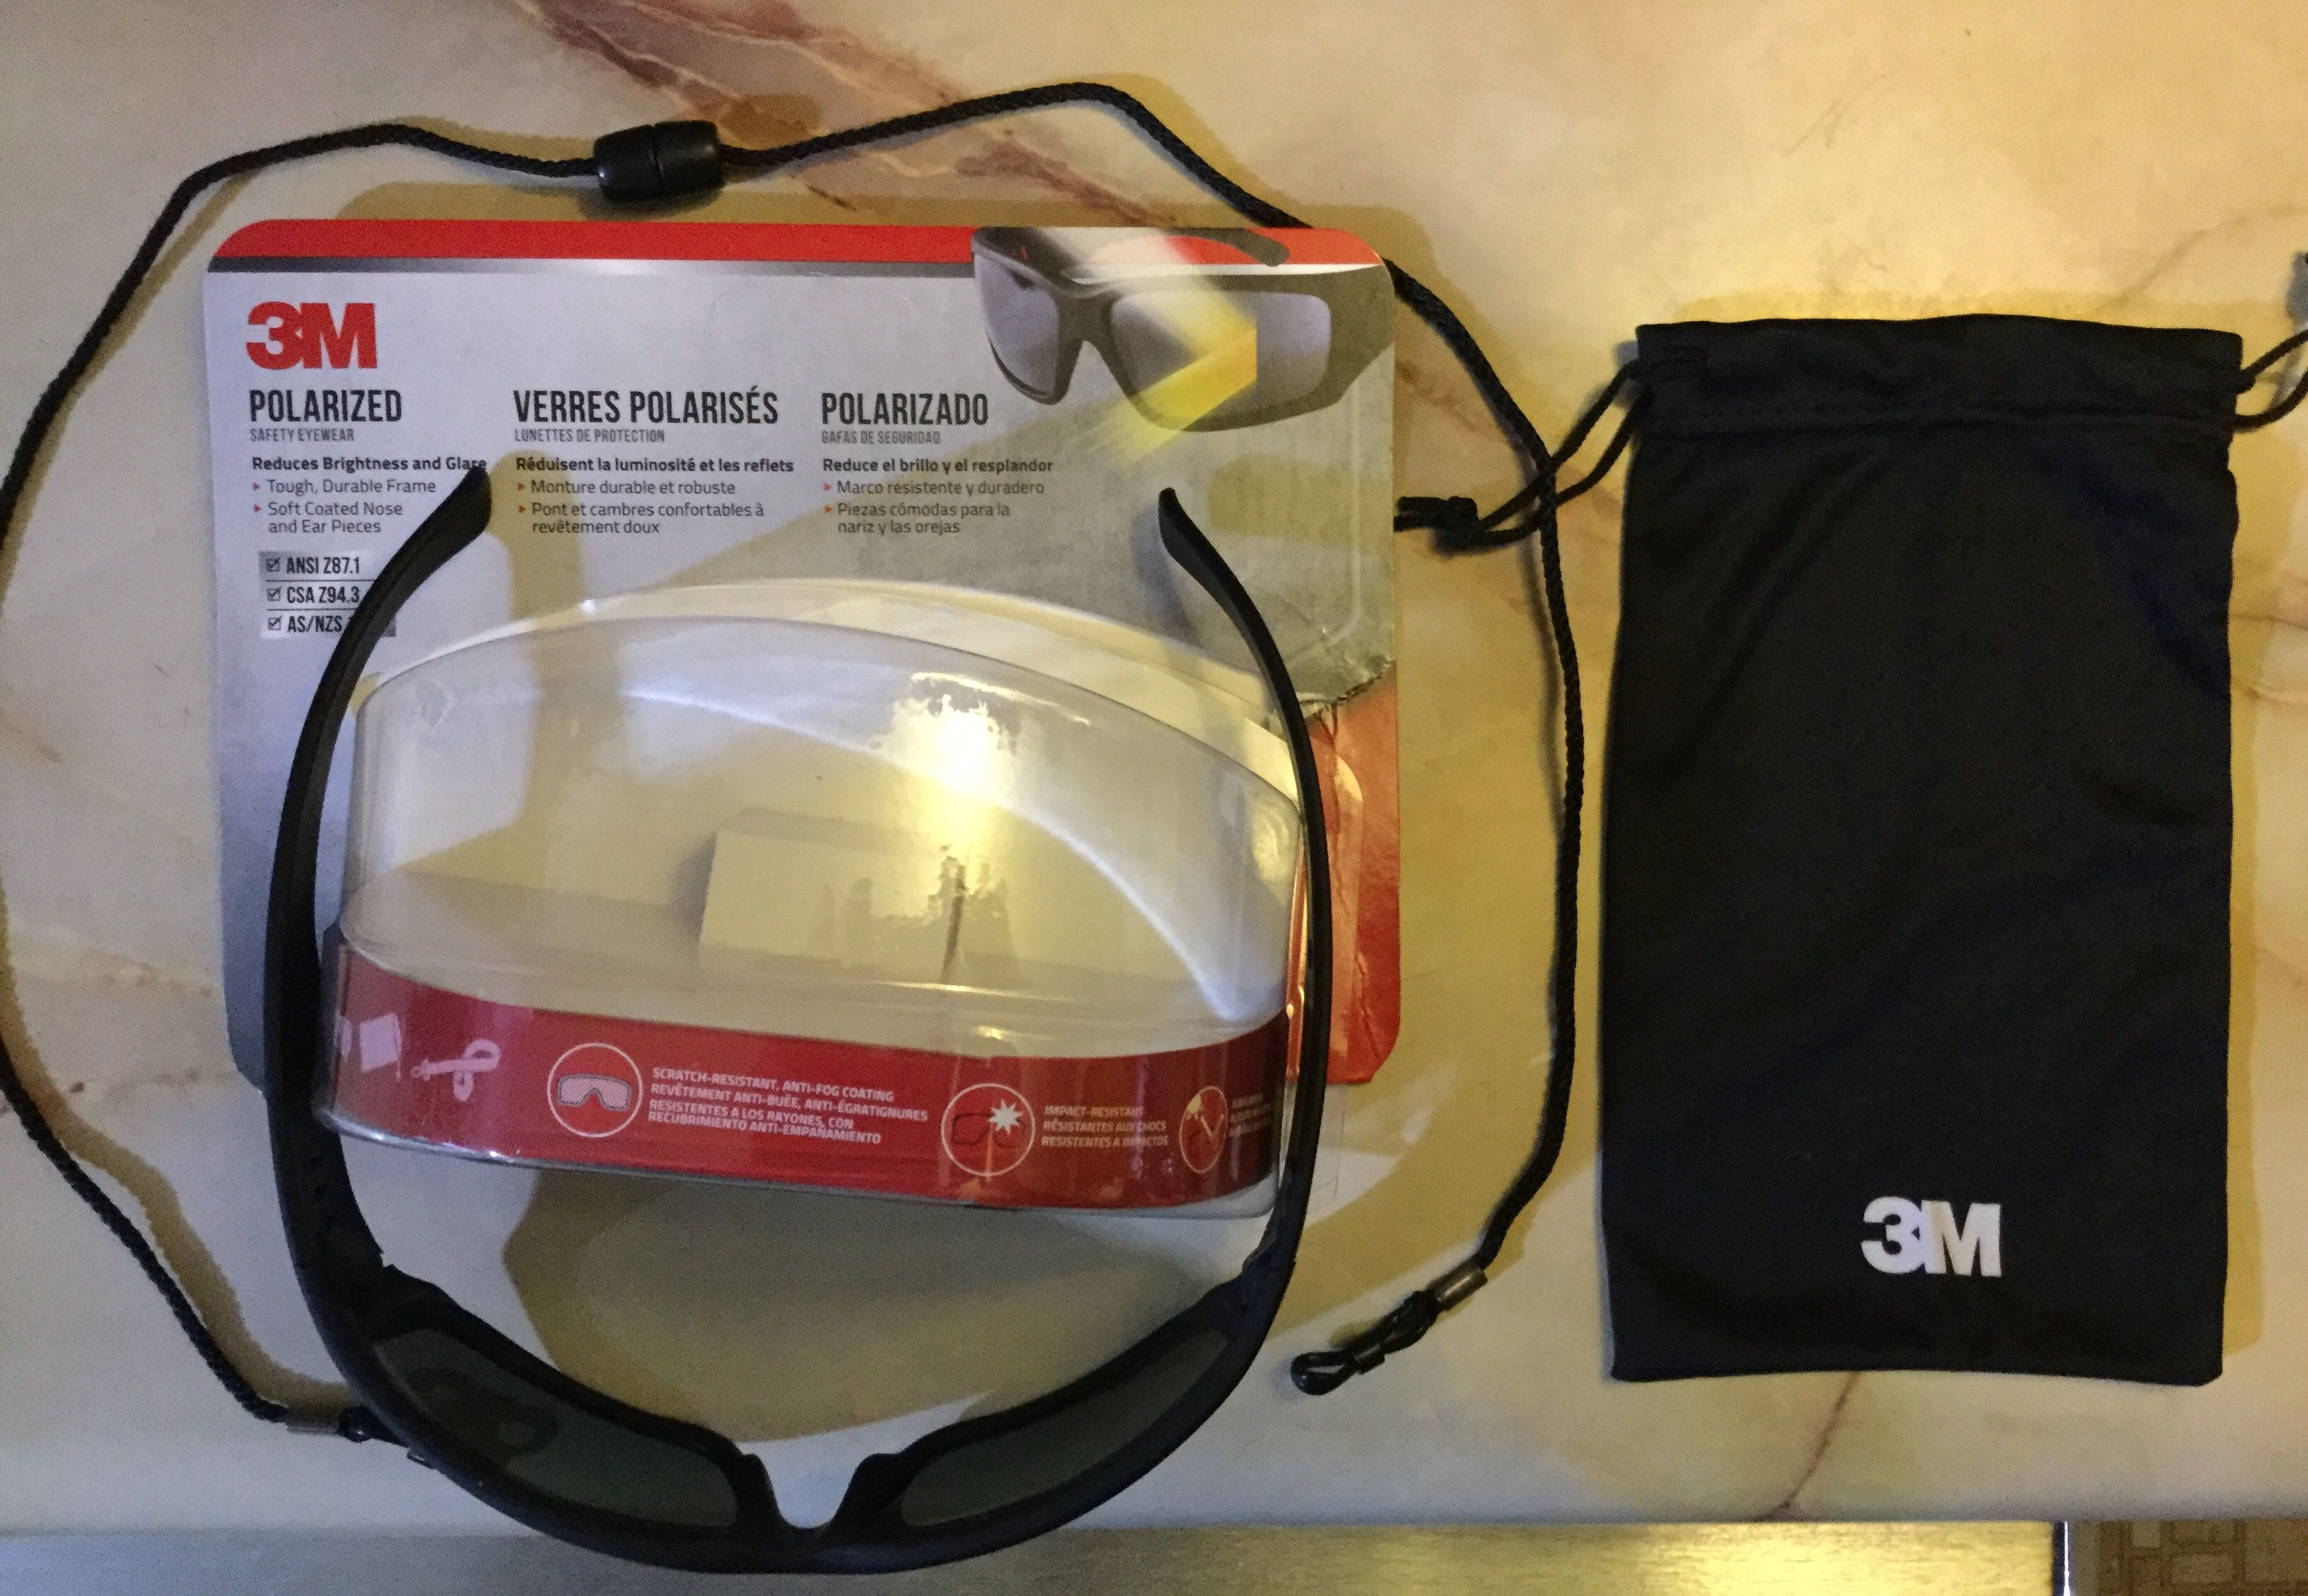 Free 3M Polarized Safety eye wear freestuff freebies